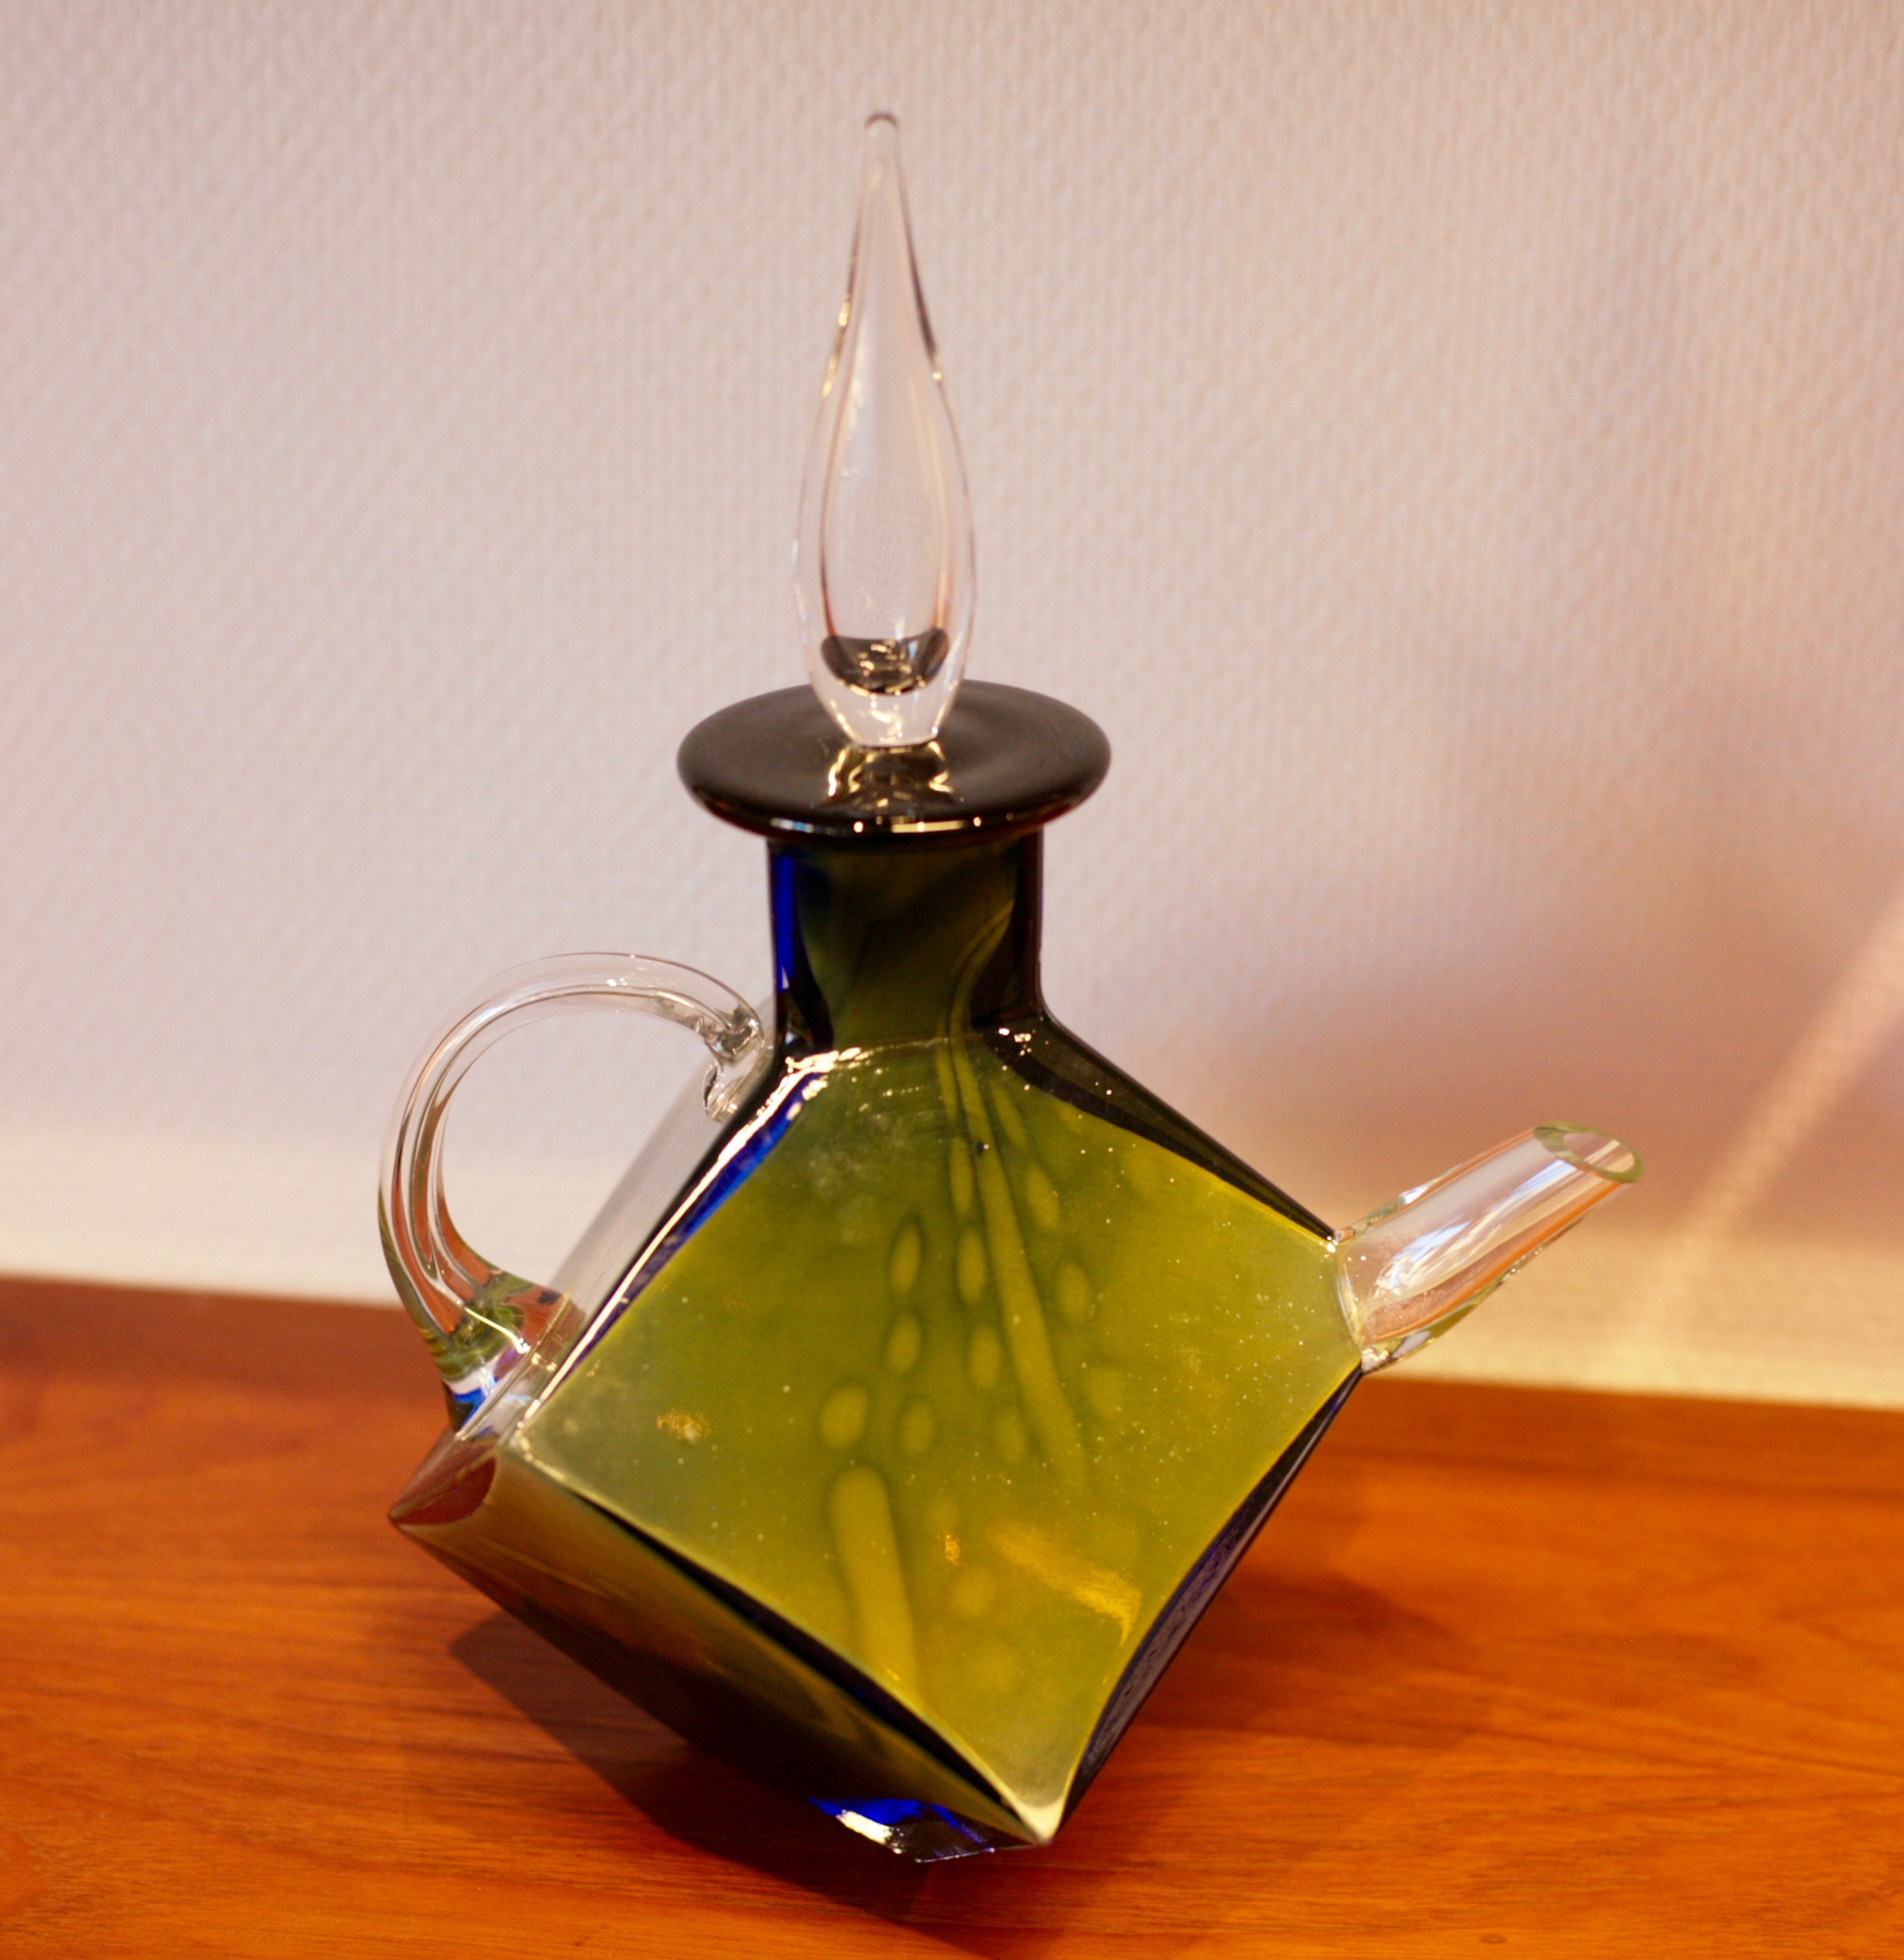 Glass teapot, graal technique, by Rolf Sinnemark